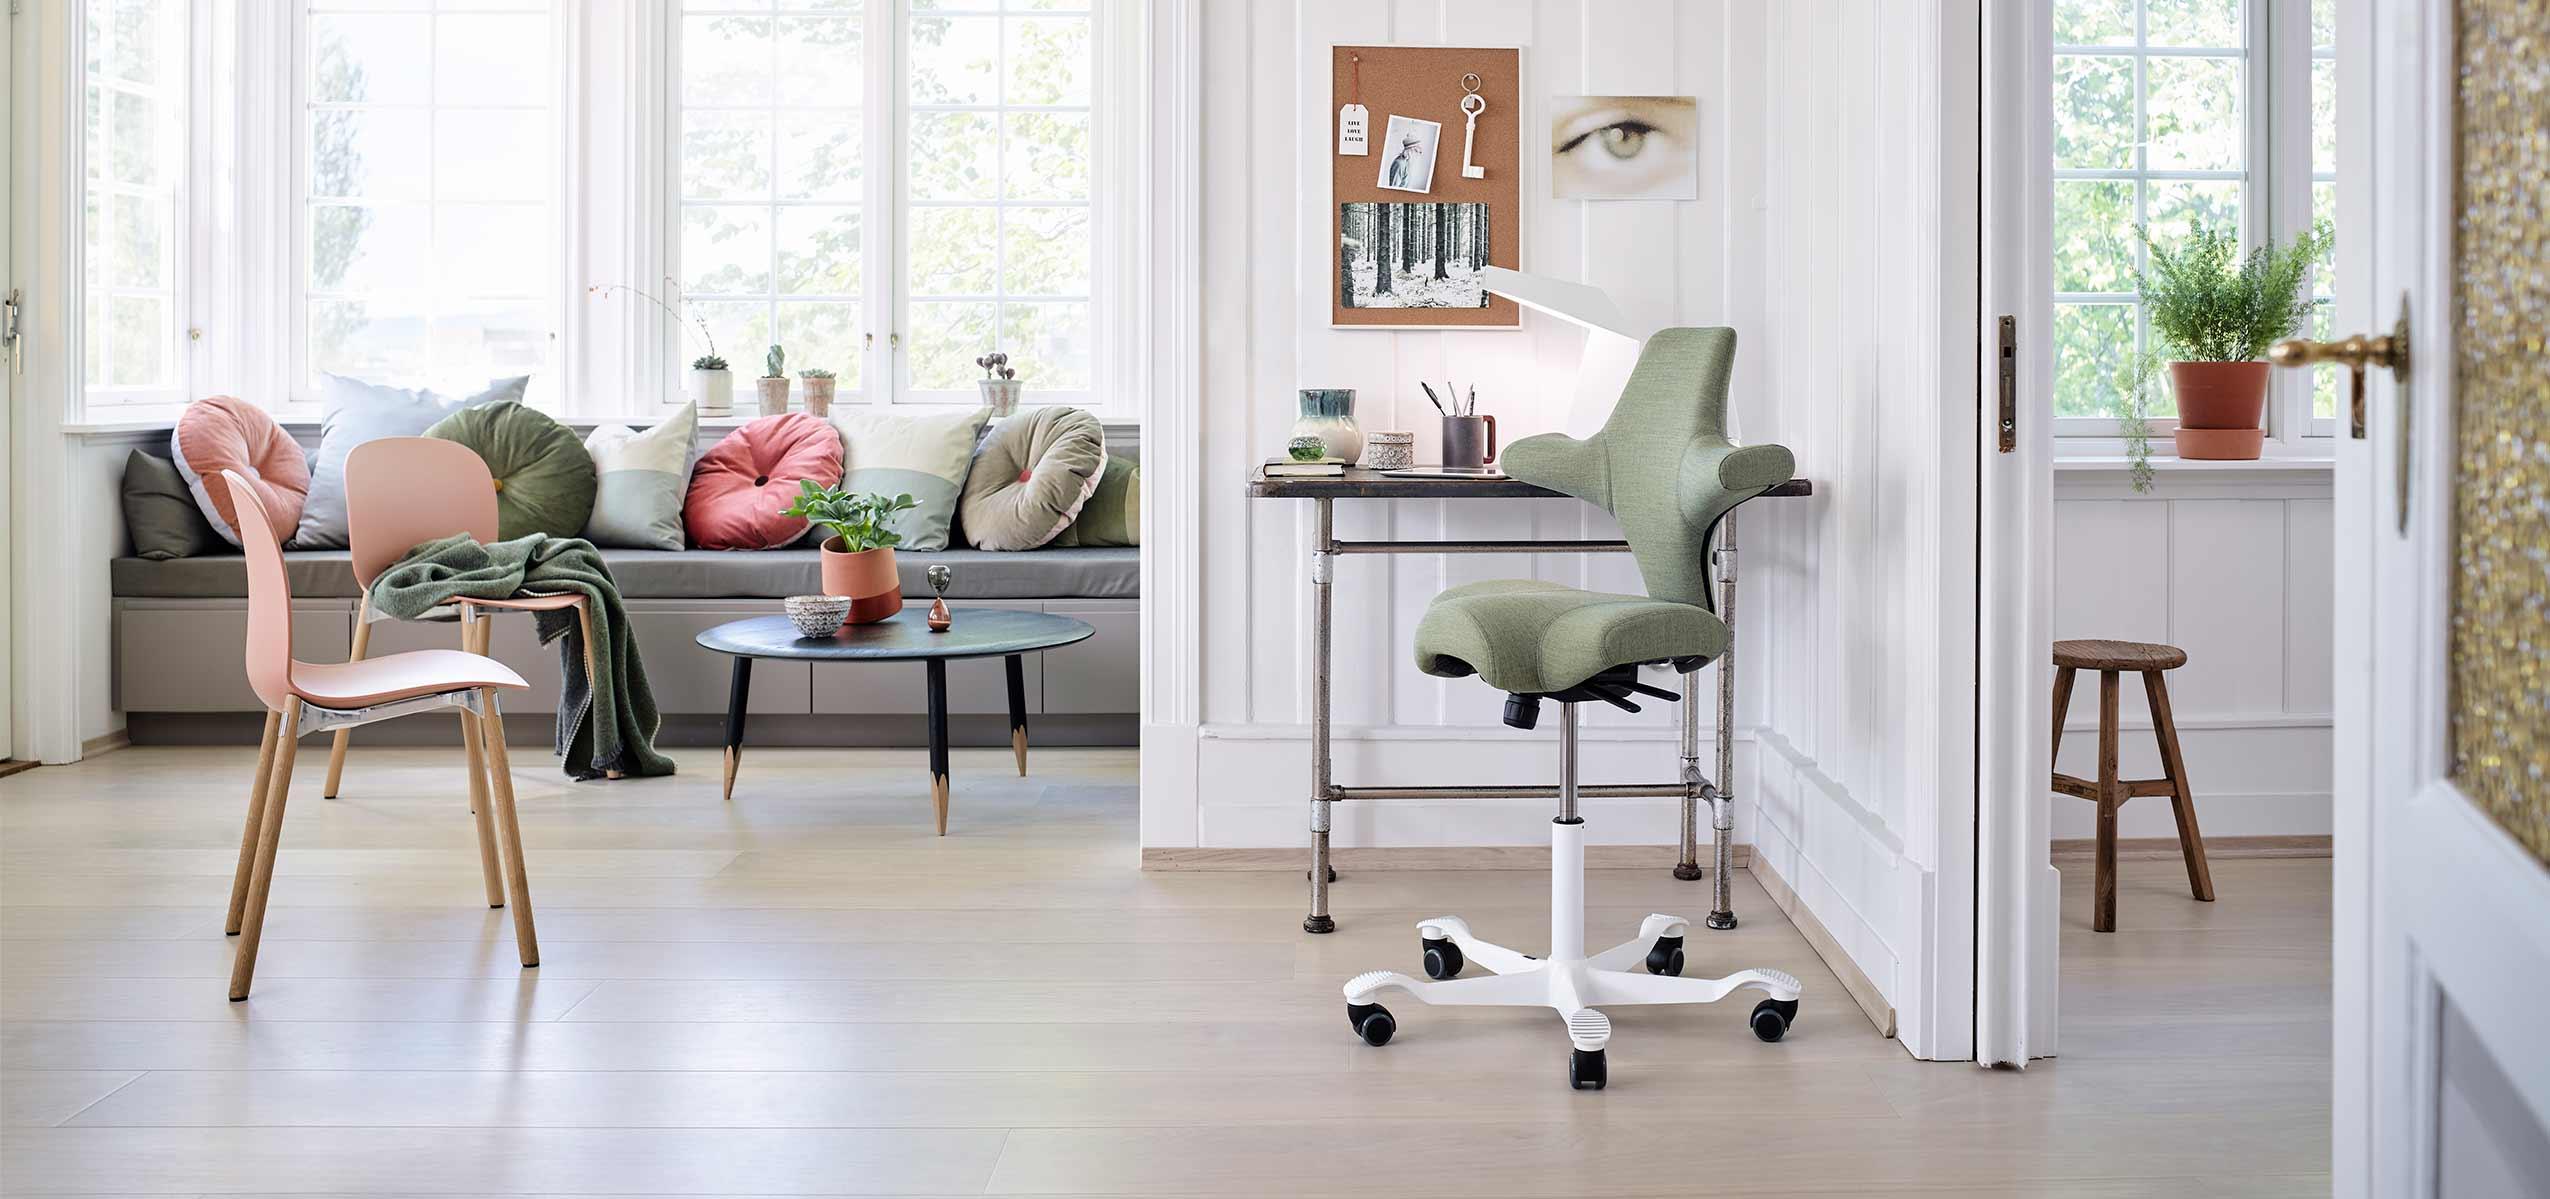 working from home HÅG Capisco chair in green in scandinavian design home office